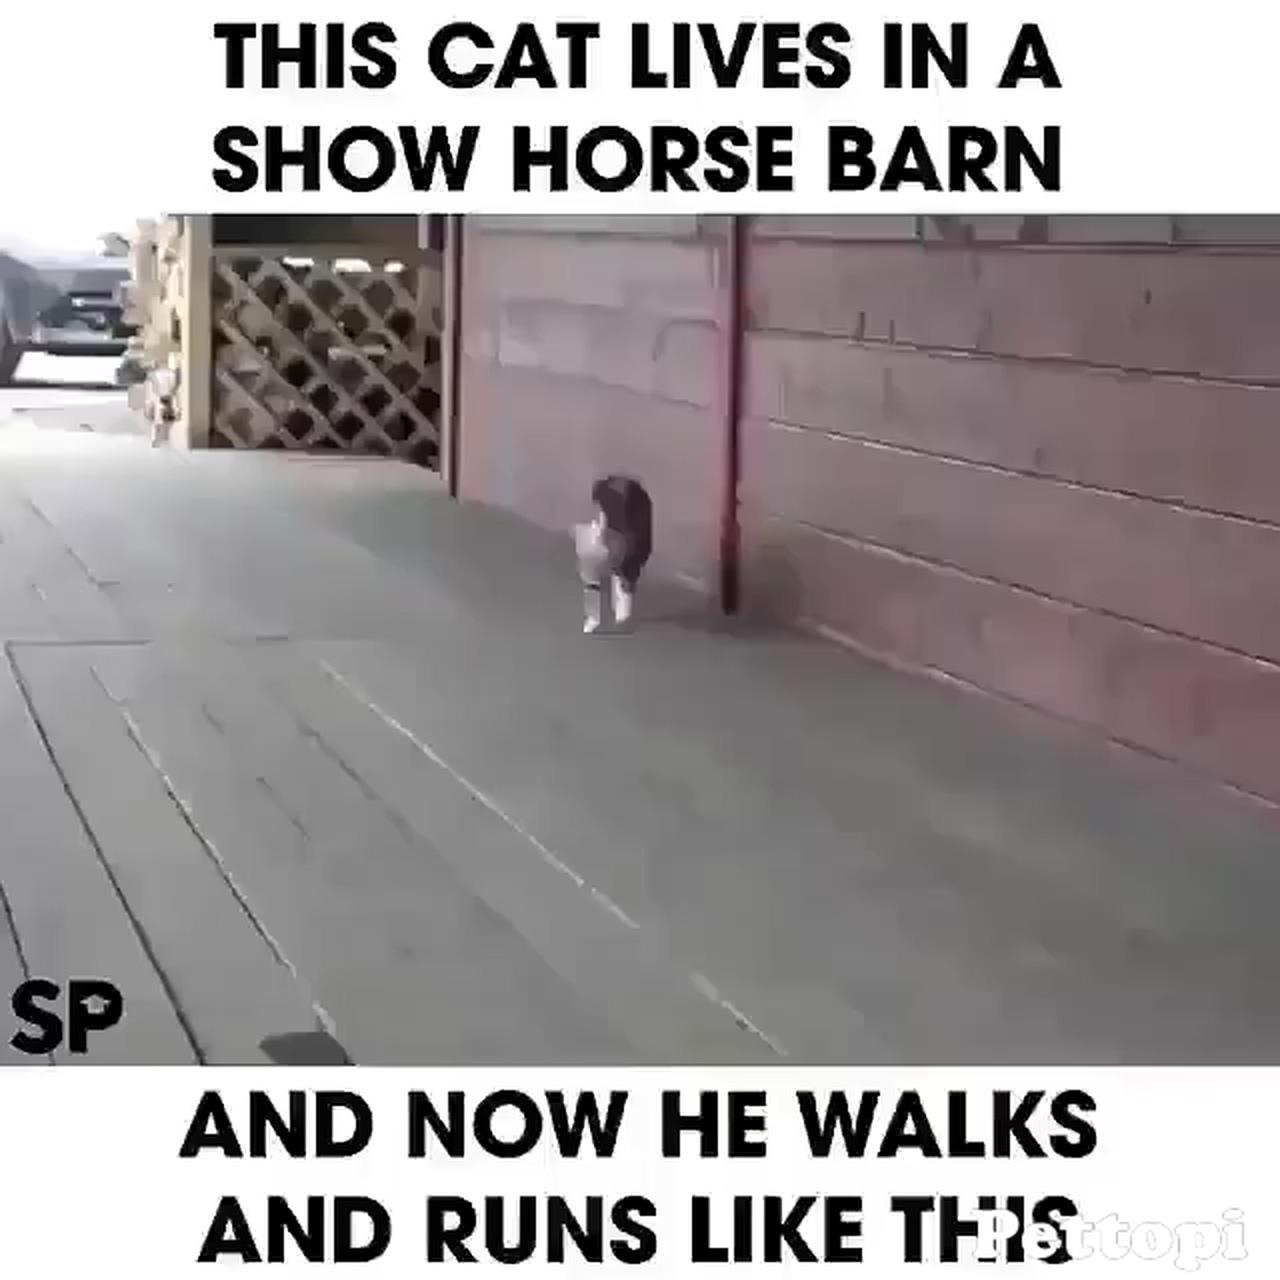 Cat walks like a dressage horse